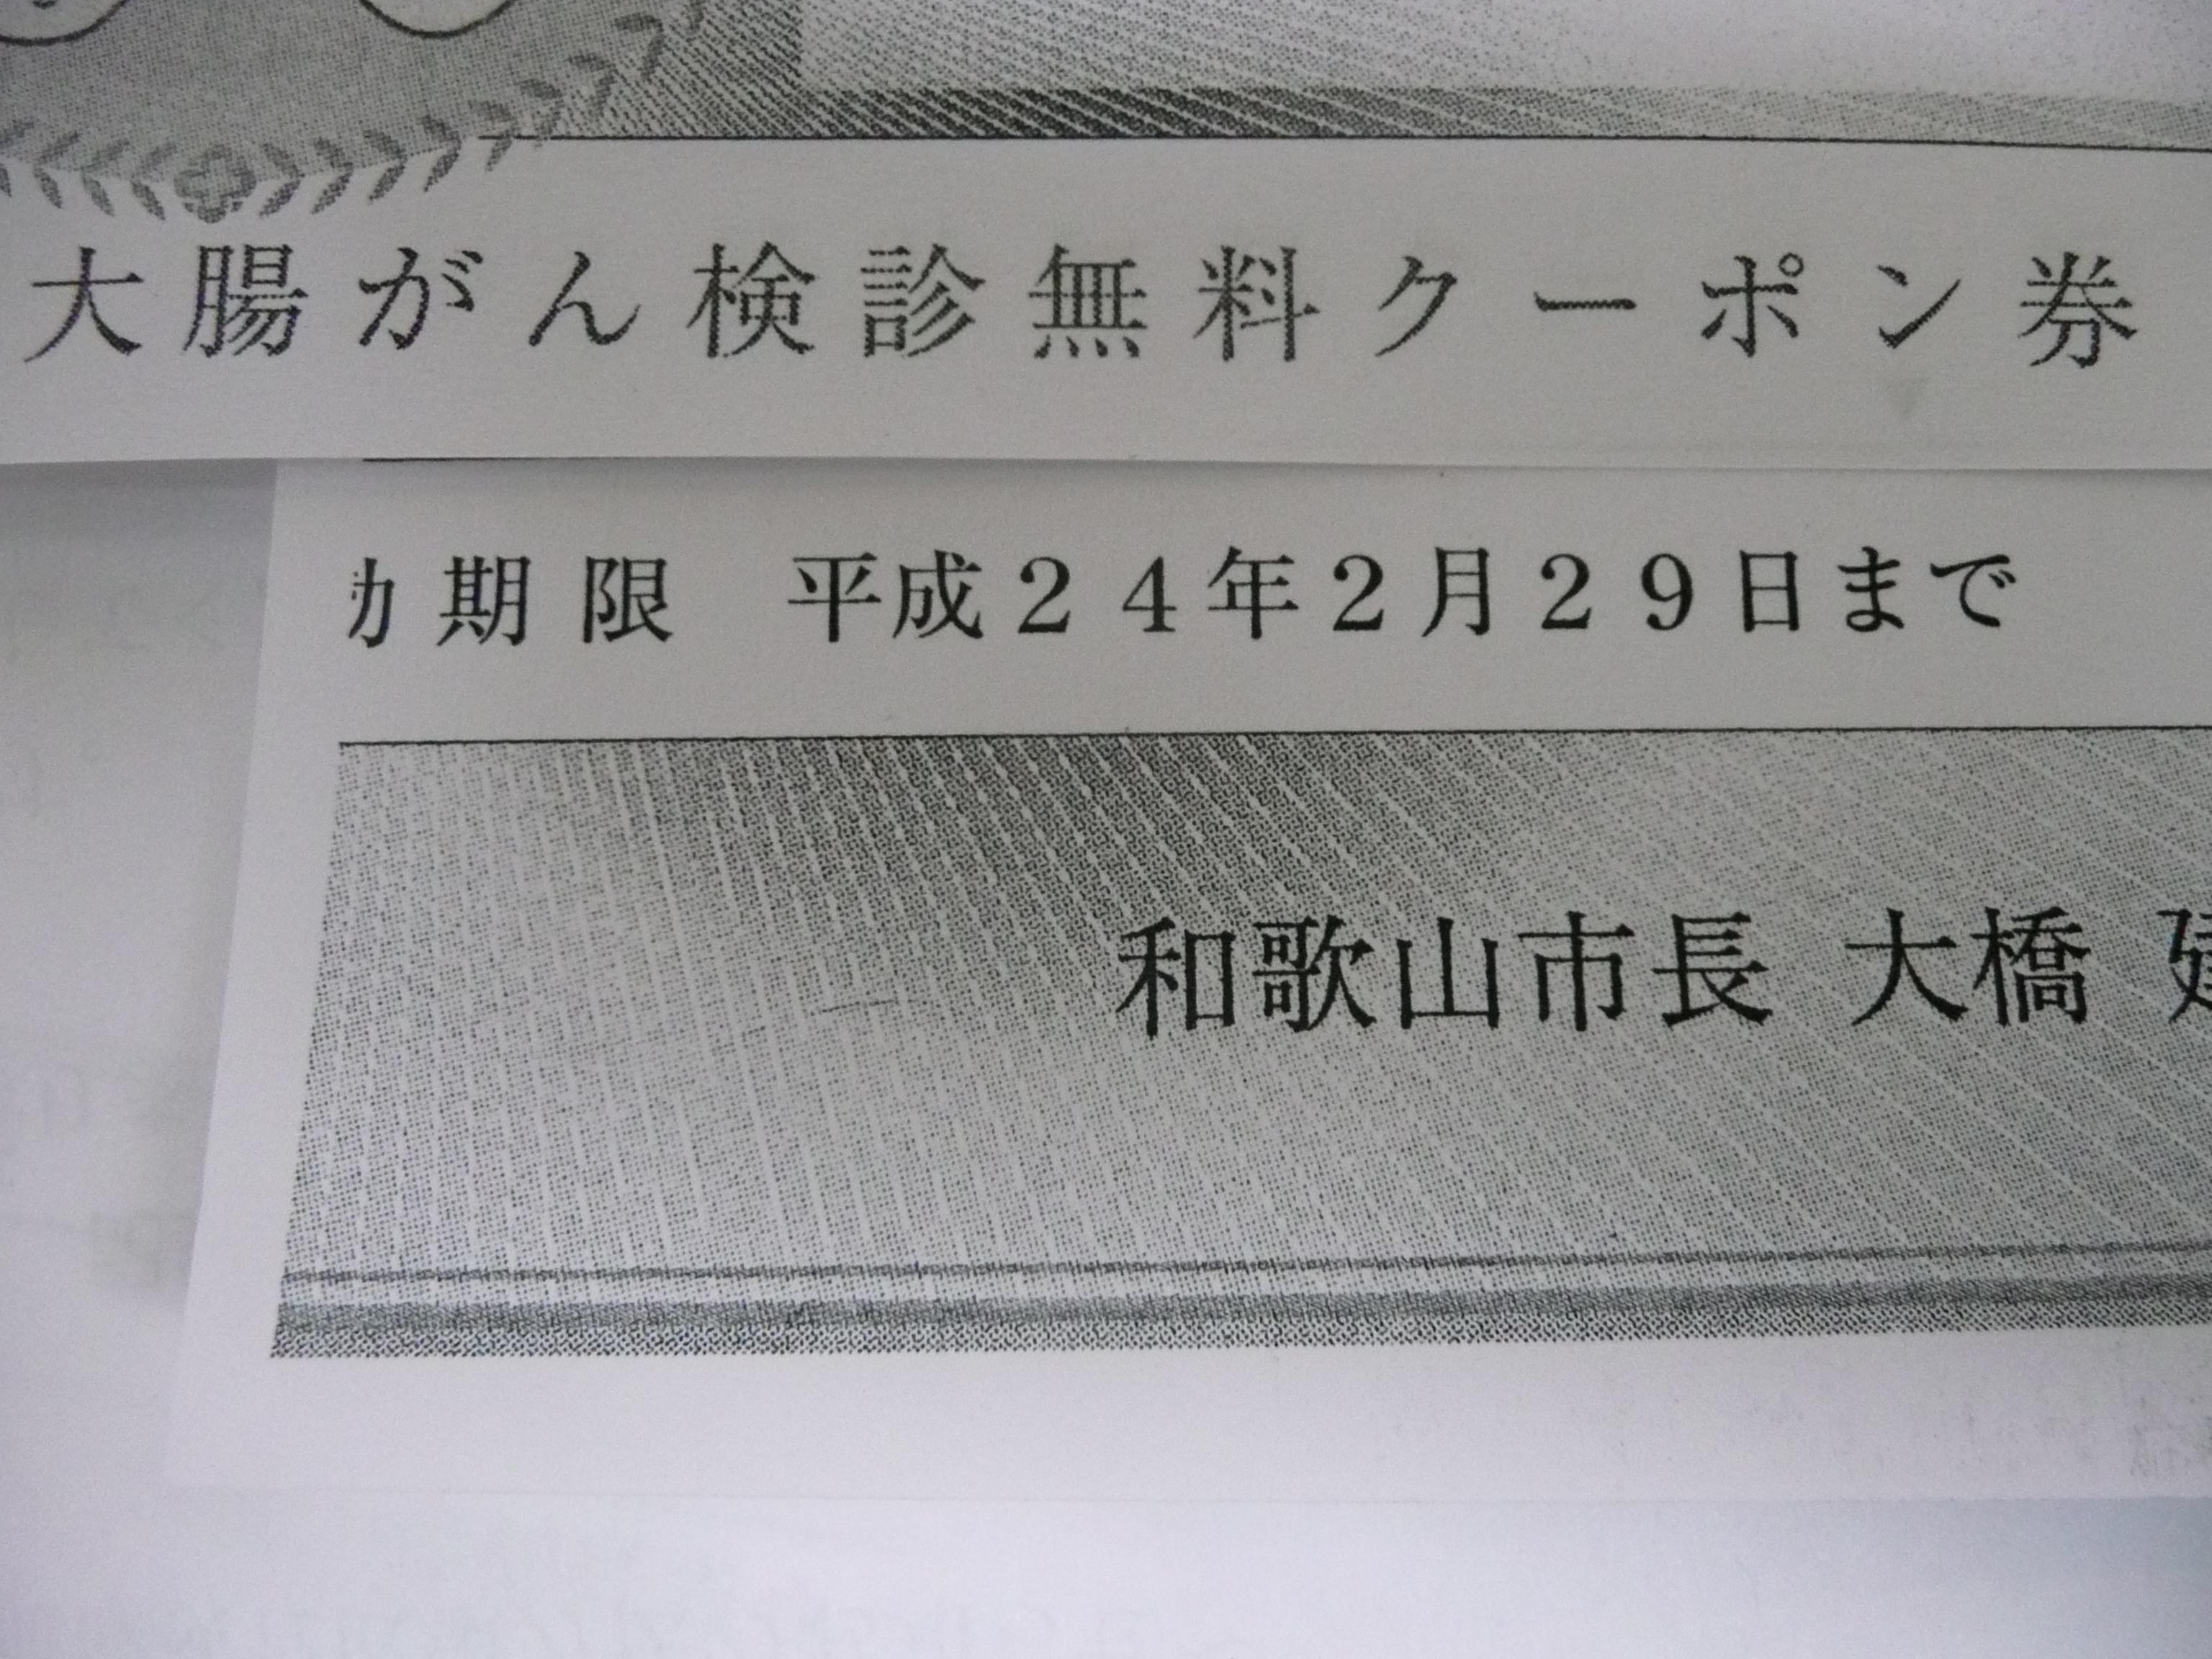 P1050136.JPG